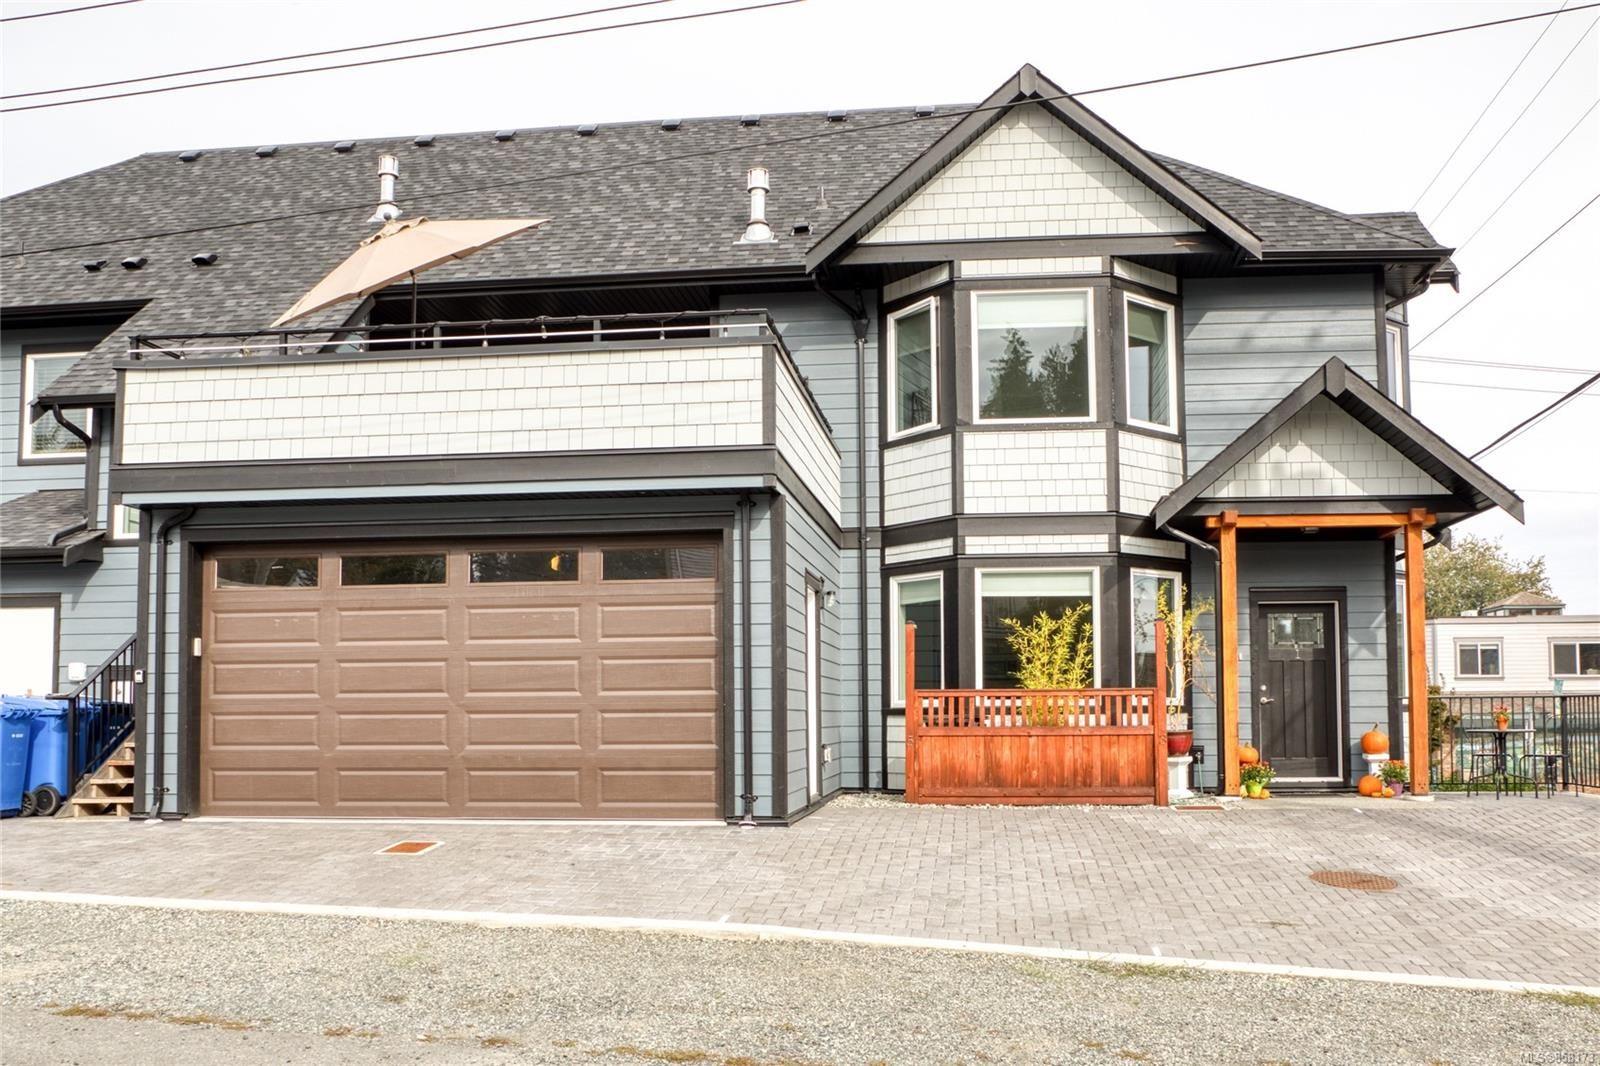 Main Photo: 1 2886 Oak St in : Du Chemainus Condo for sale (Duncan)  : MLS®# 858173